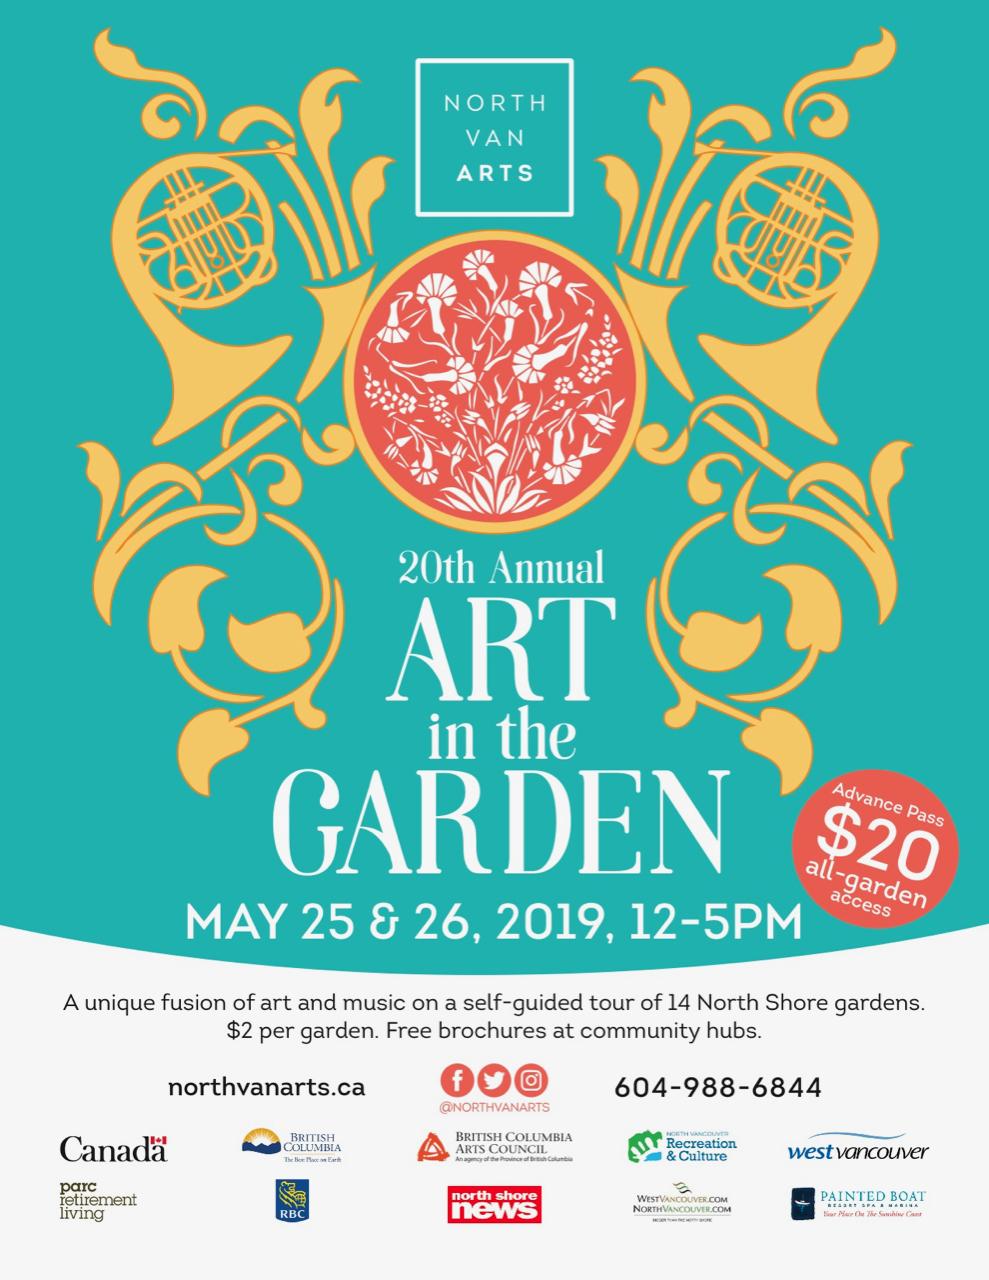 art-in-the-garden-2019.jpg